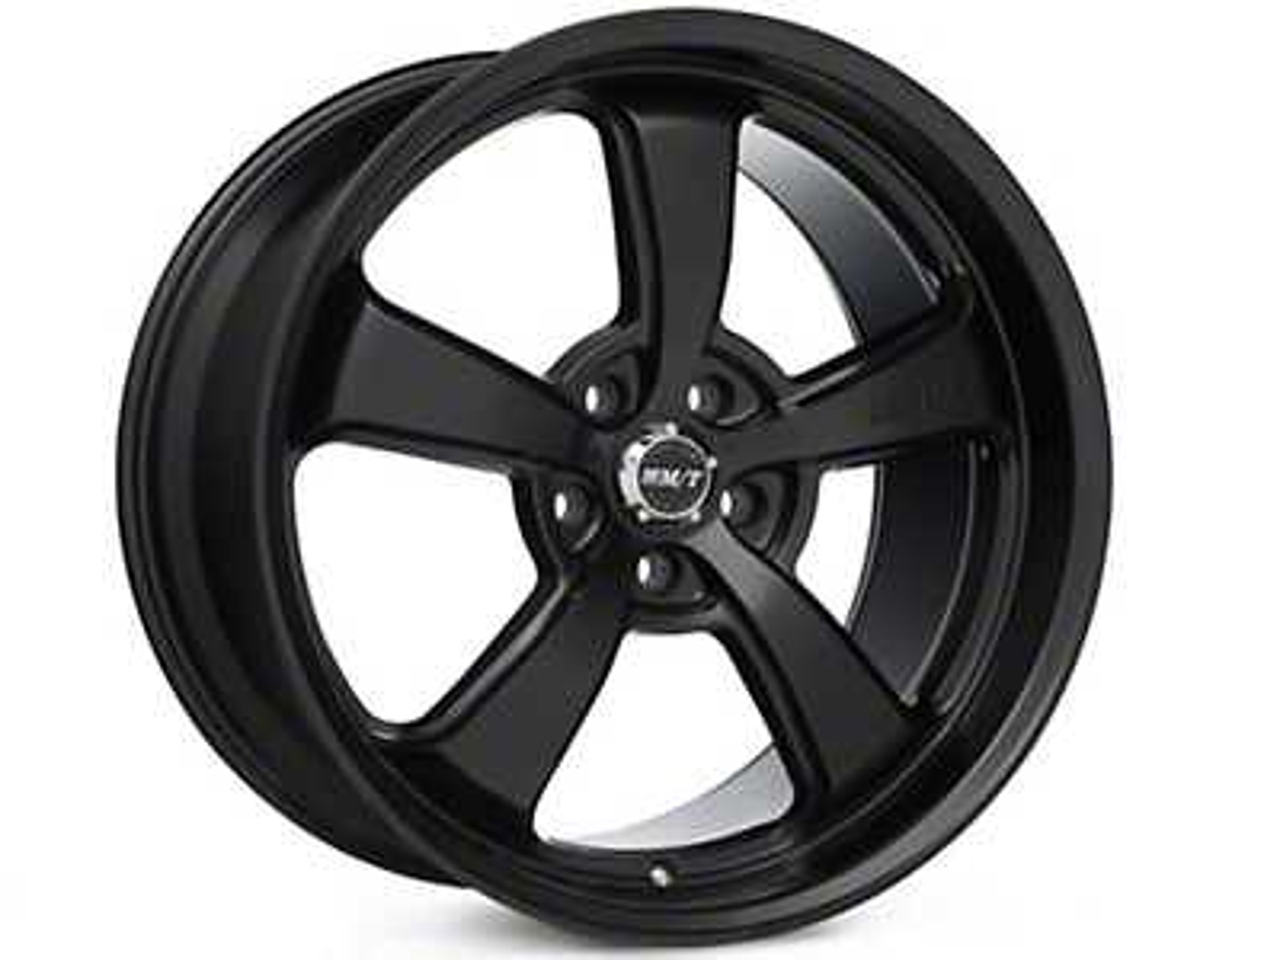 Mickey Thompson SC-5 Flat Black Wheel - 20x10.5 (05-14 GT, V6)